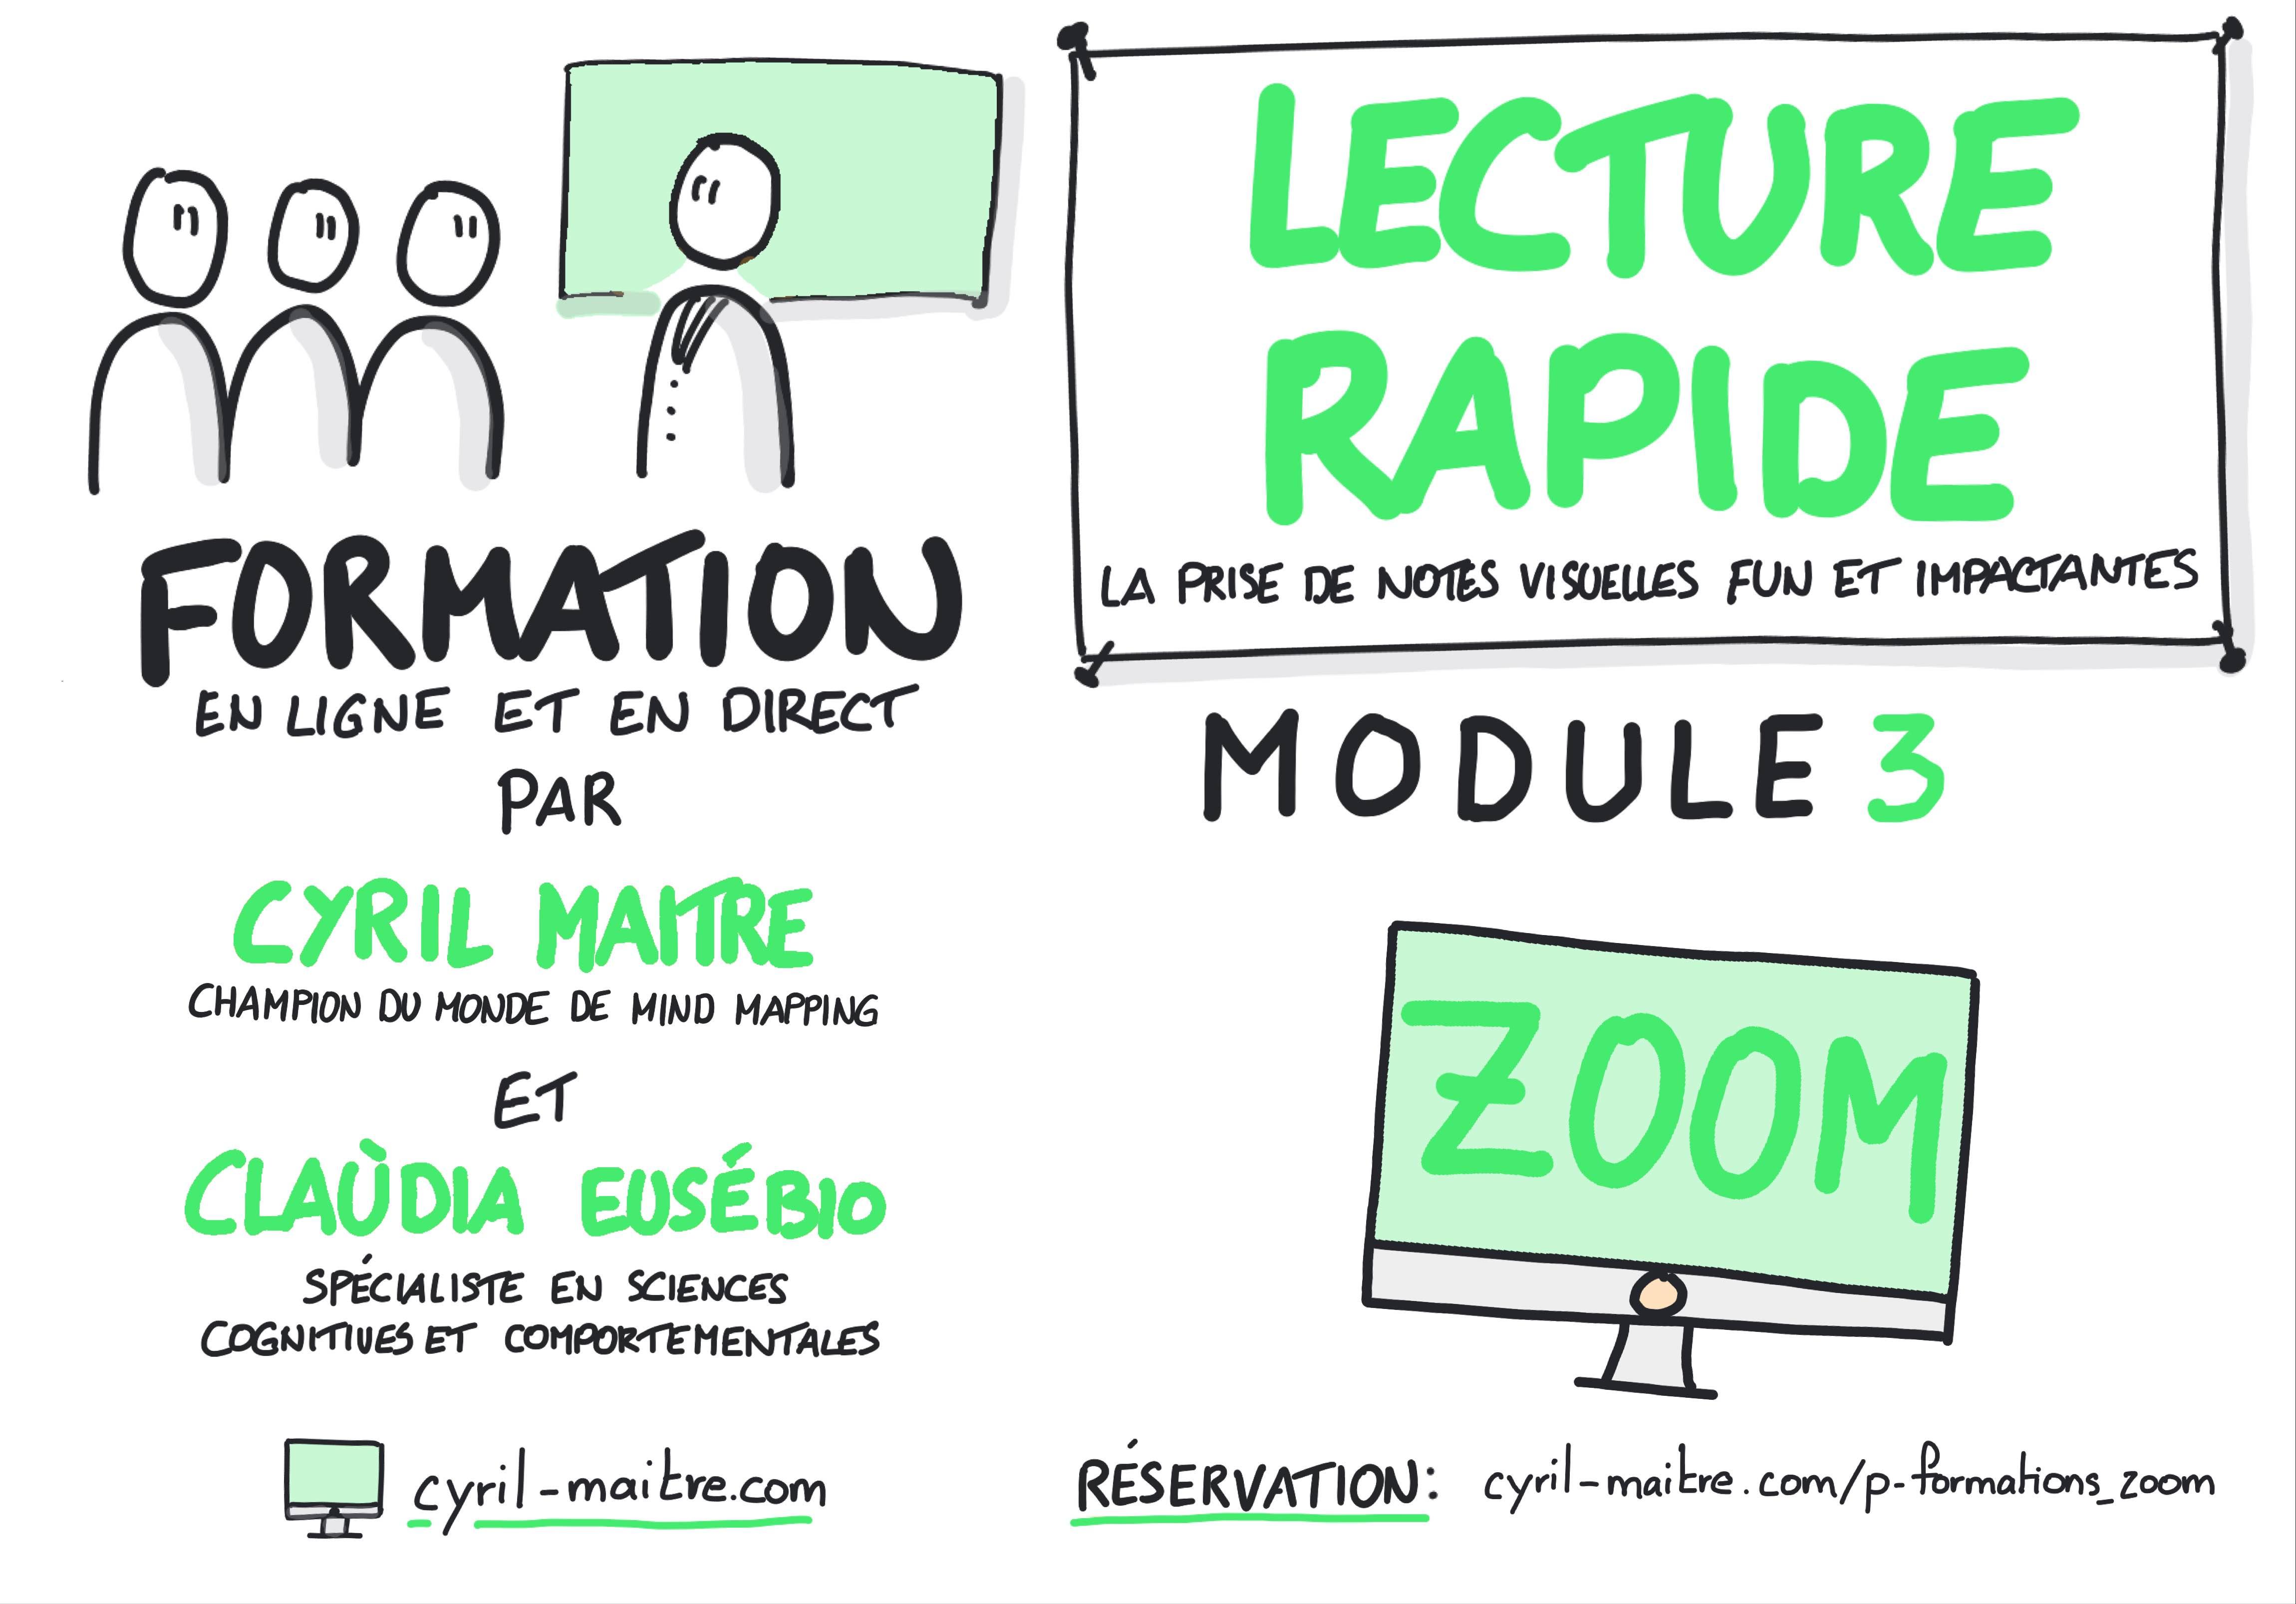 cyril maitre claudia eusebio formation lecture rapide3